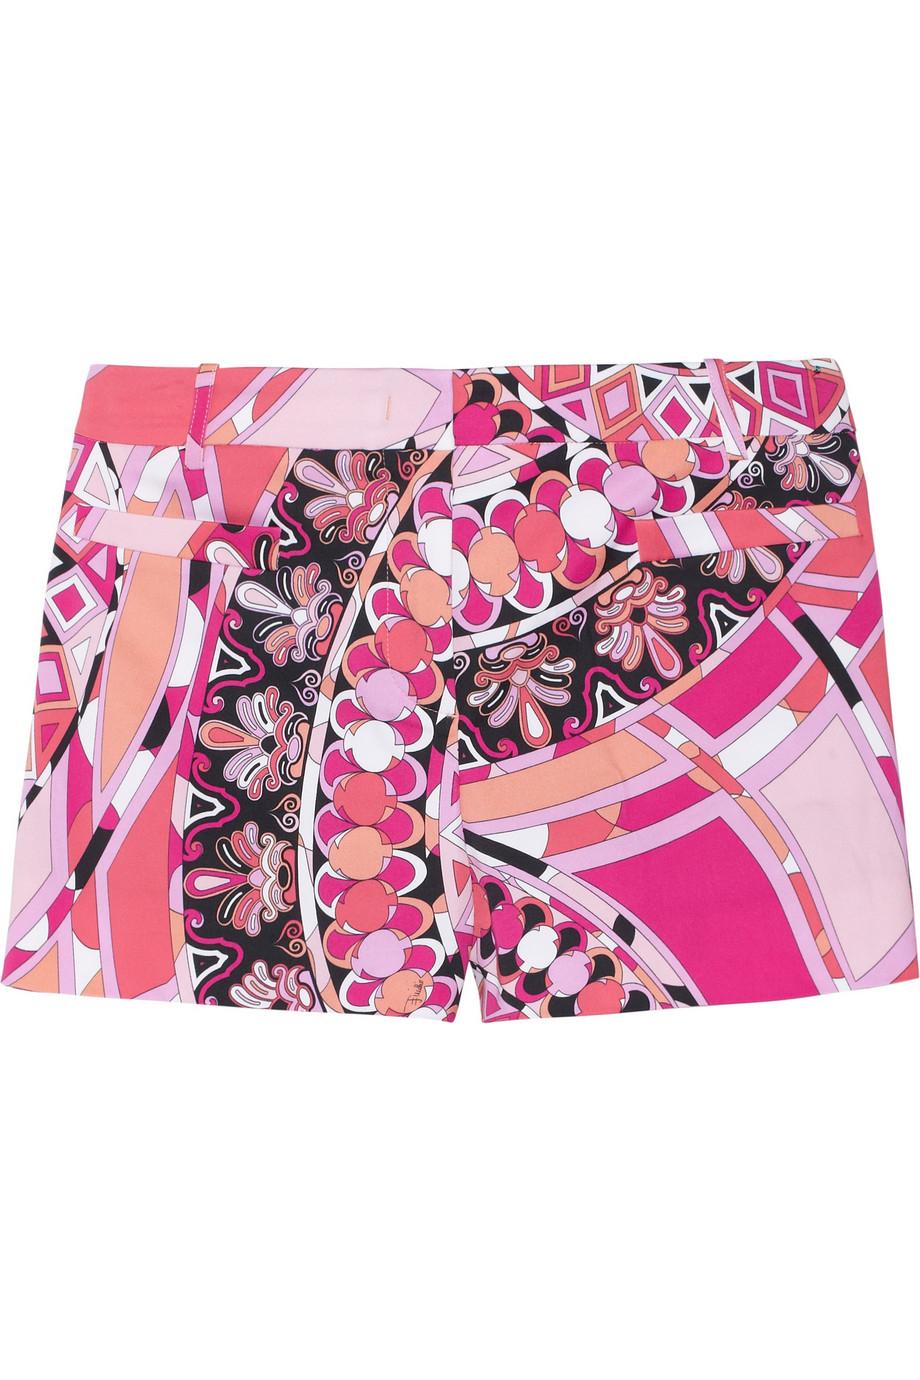 bcd58e79e59d Lyst - Emilio Pucci Printed Stretchcotton Shorts in Pink